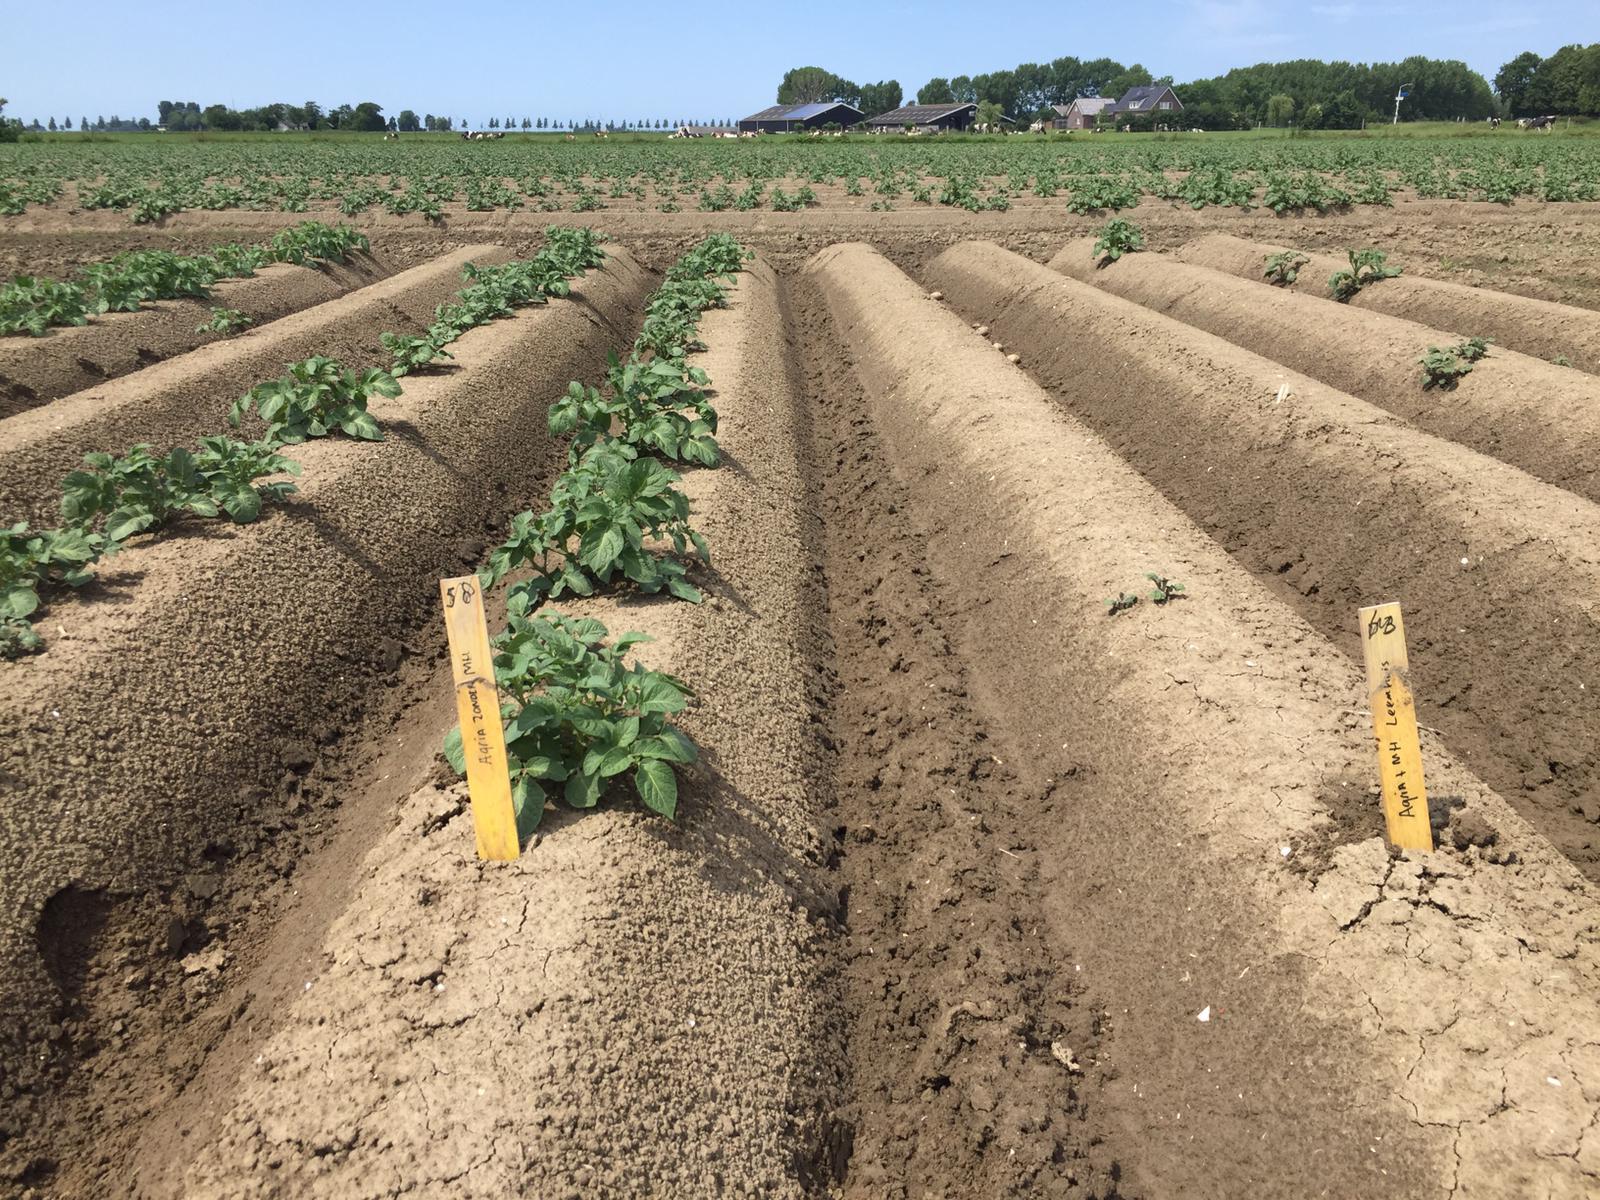 Royal MH basis voor optimale bestrijding van aardappelopslag